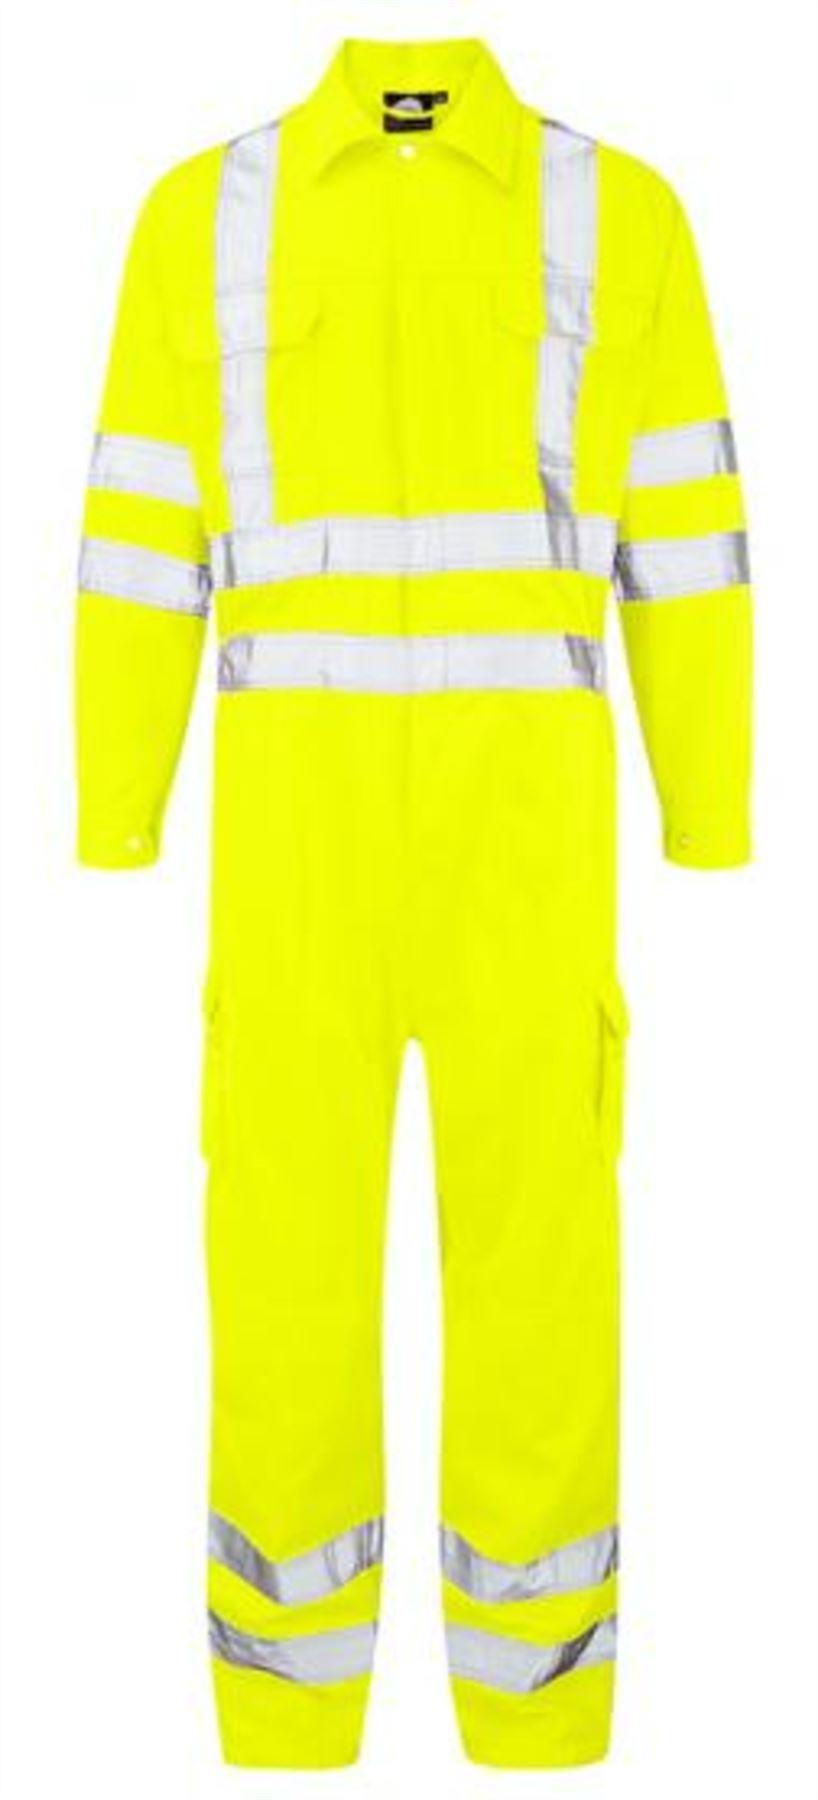 Orn Shrike Hi Vis Overall - Yellow 5XL32L